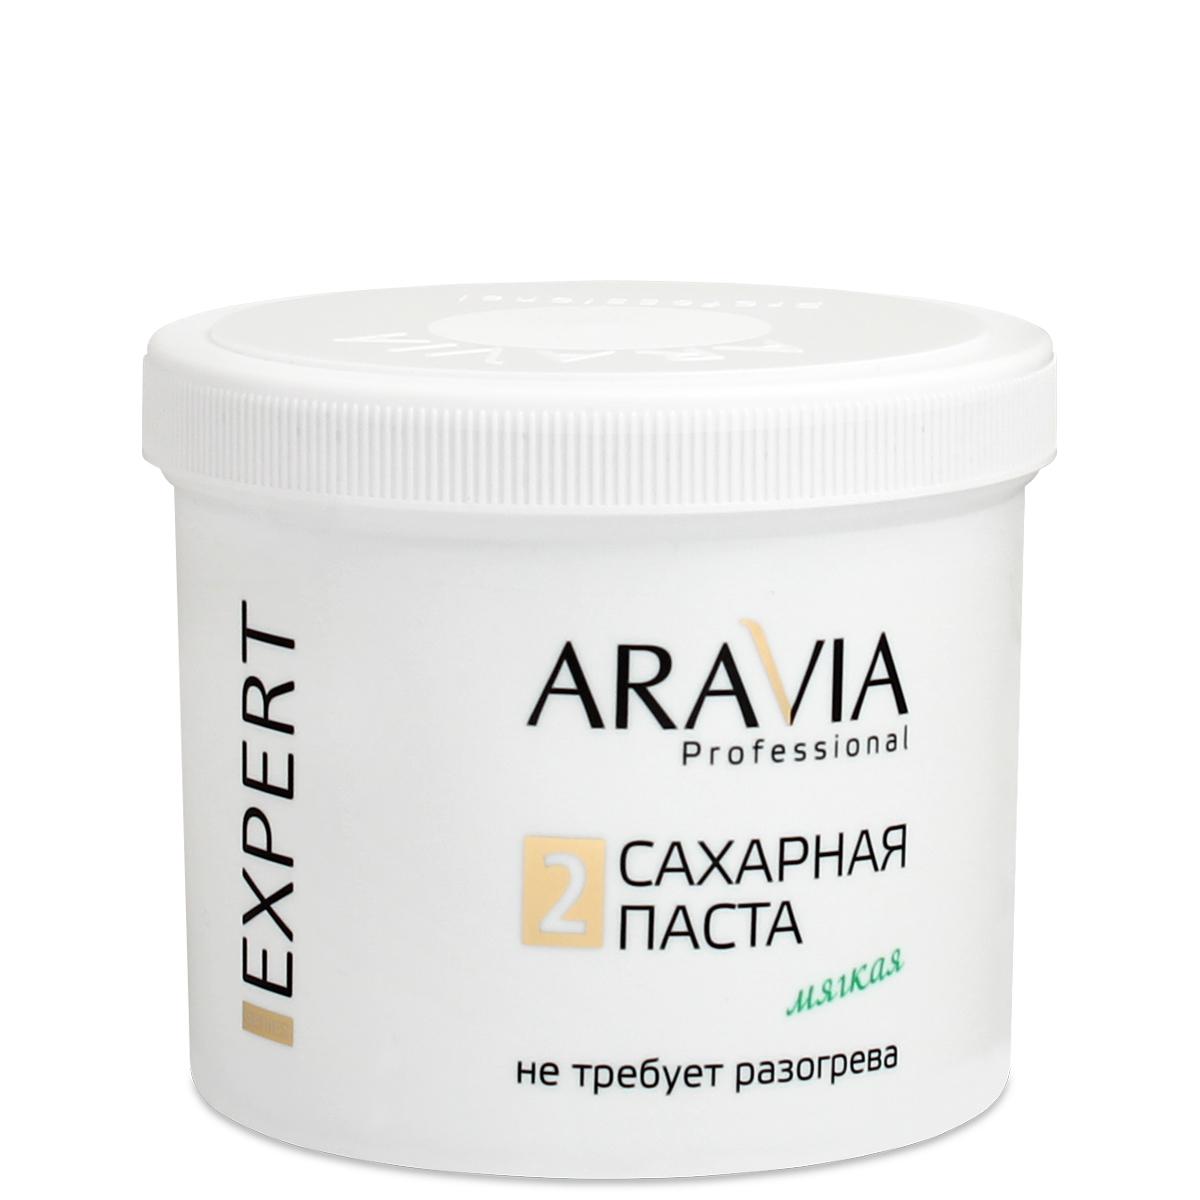 ARAVIA Паста сахарная для депиляции Мягкая / EXPERT 750гр